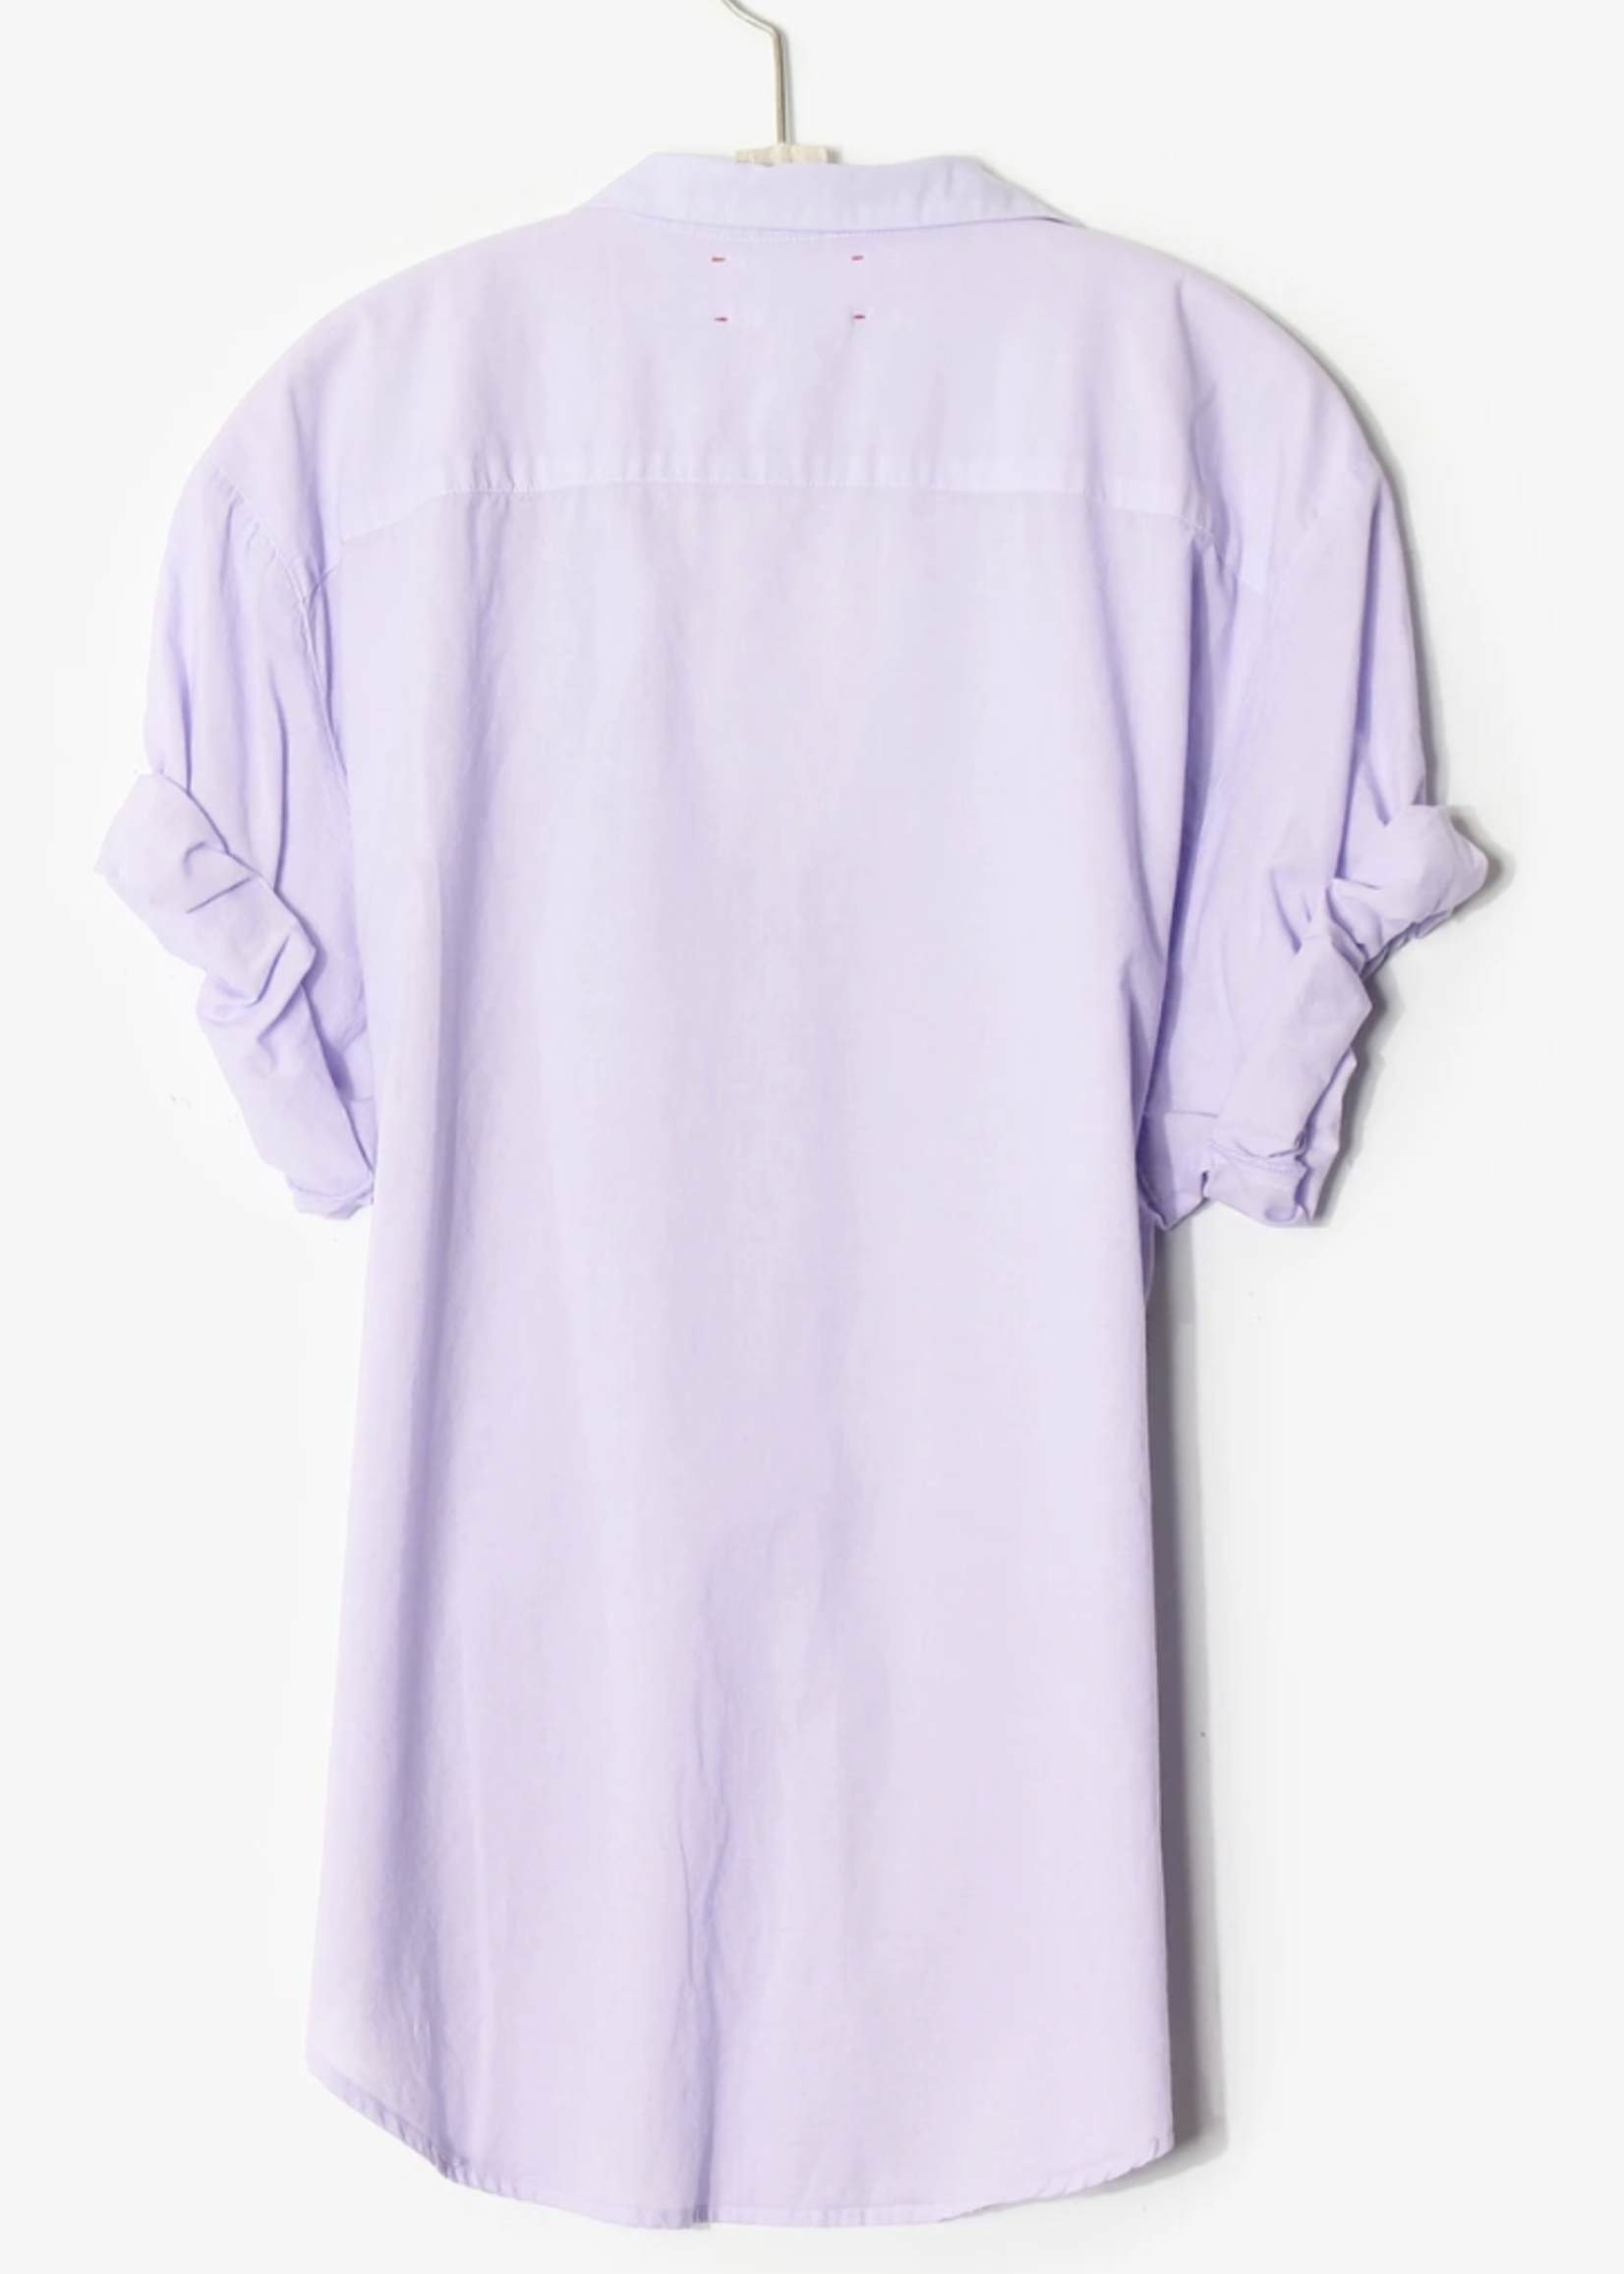 xirena xirena channing shirt lavender bloom